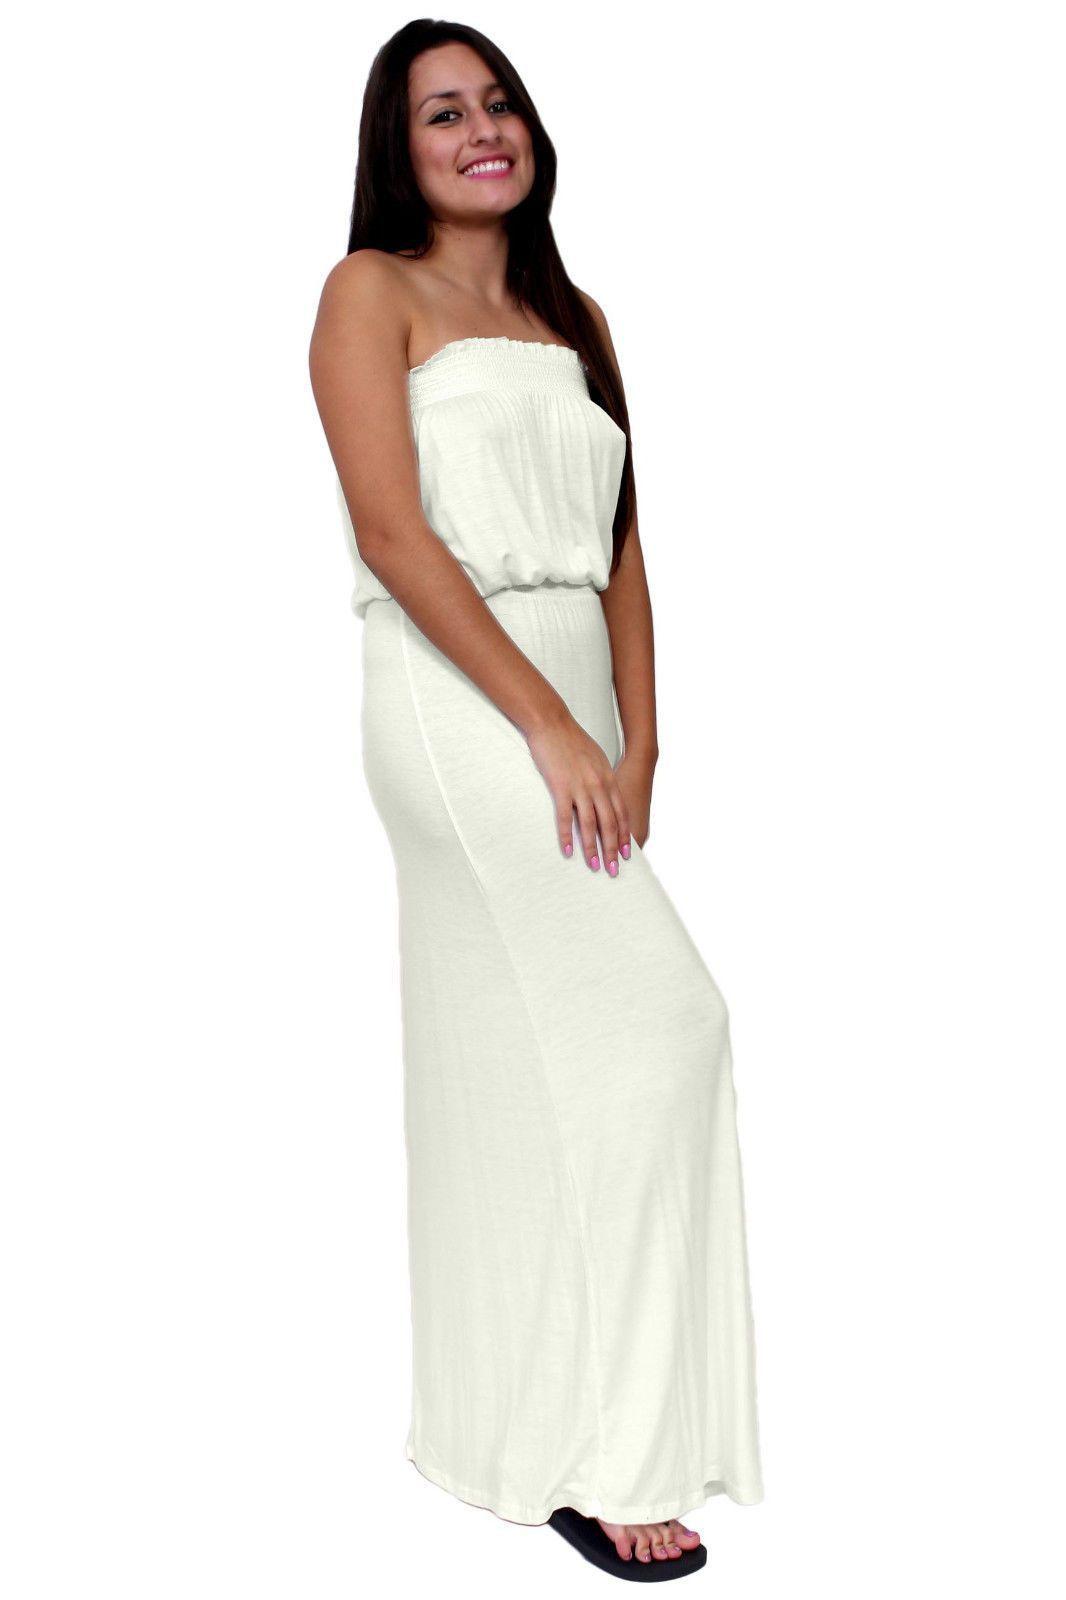 ad952e120ad Women S Casual Ruffle Trim Smocked Tube Top Ivory Maxi Dress Waistband  Stretch